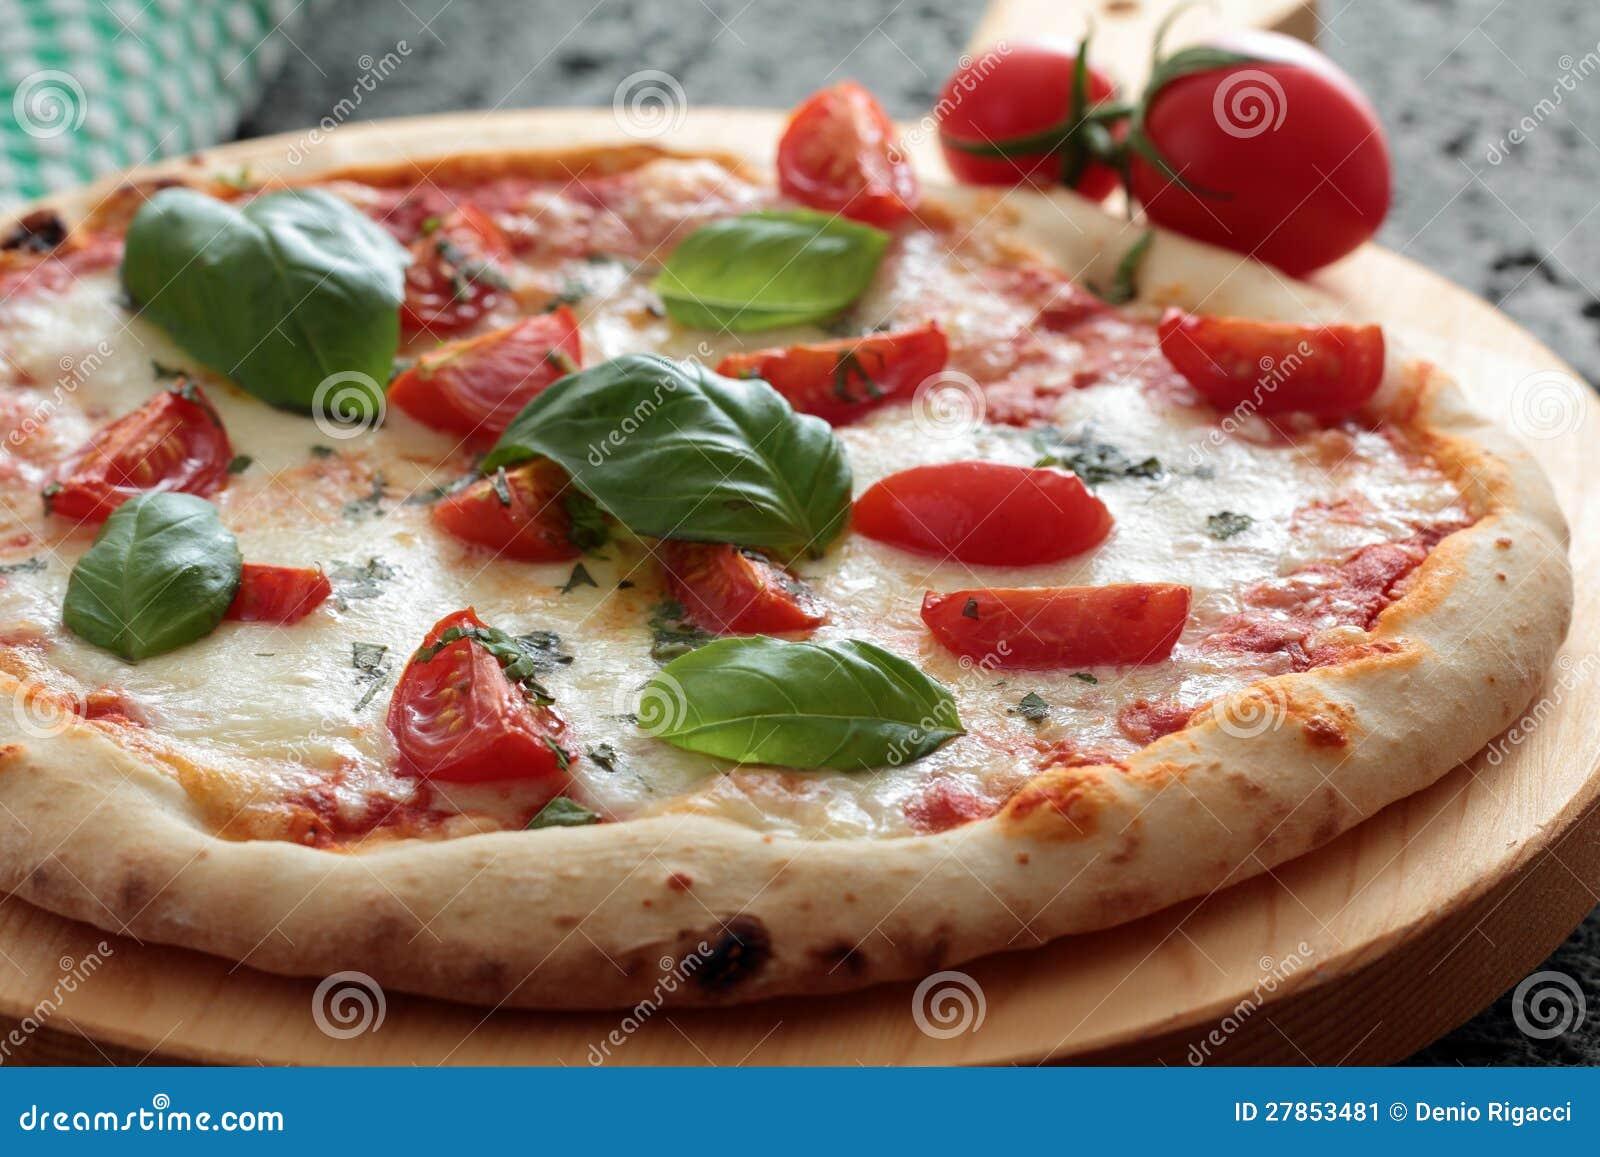 Pizza Margherita z pomidorem i basilem